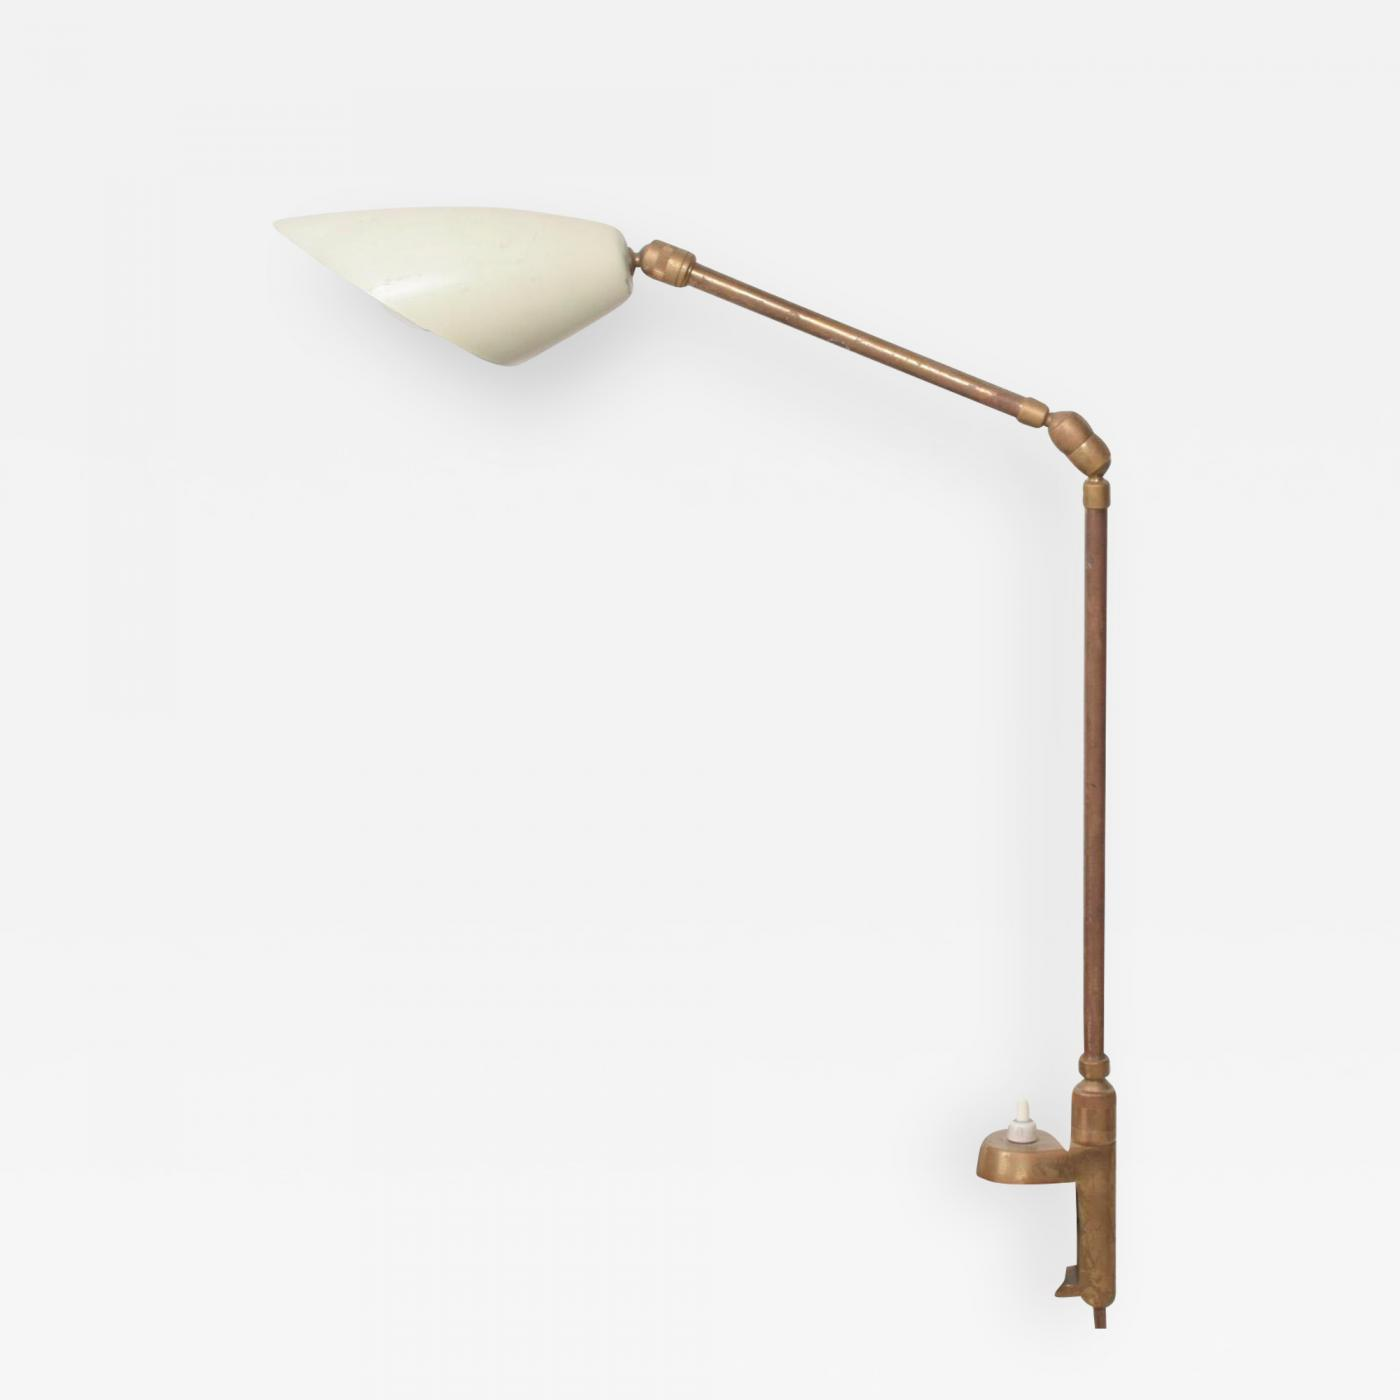 Image of: Stilnovo Midcentury Modern Stilnovo Clamp Table Lamp In Brass 1950s